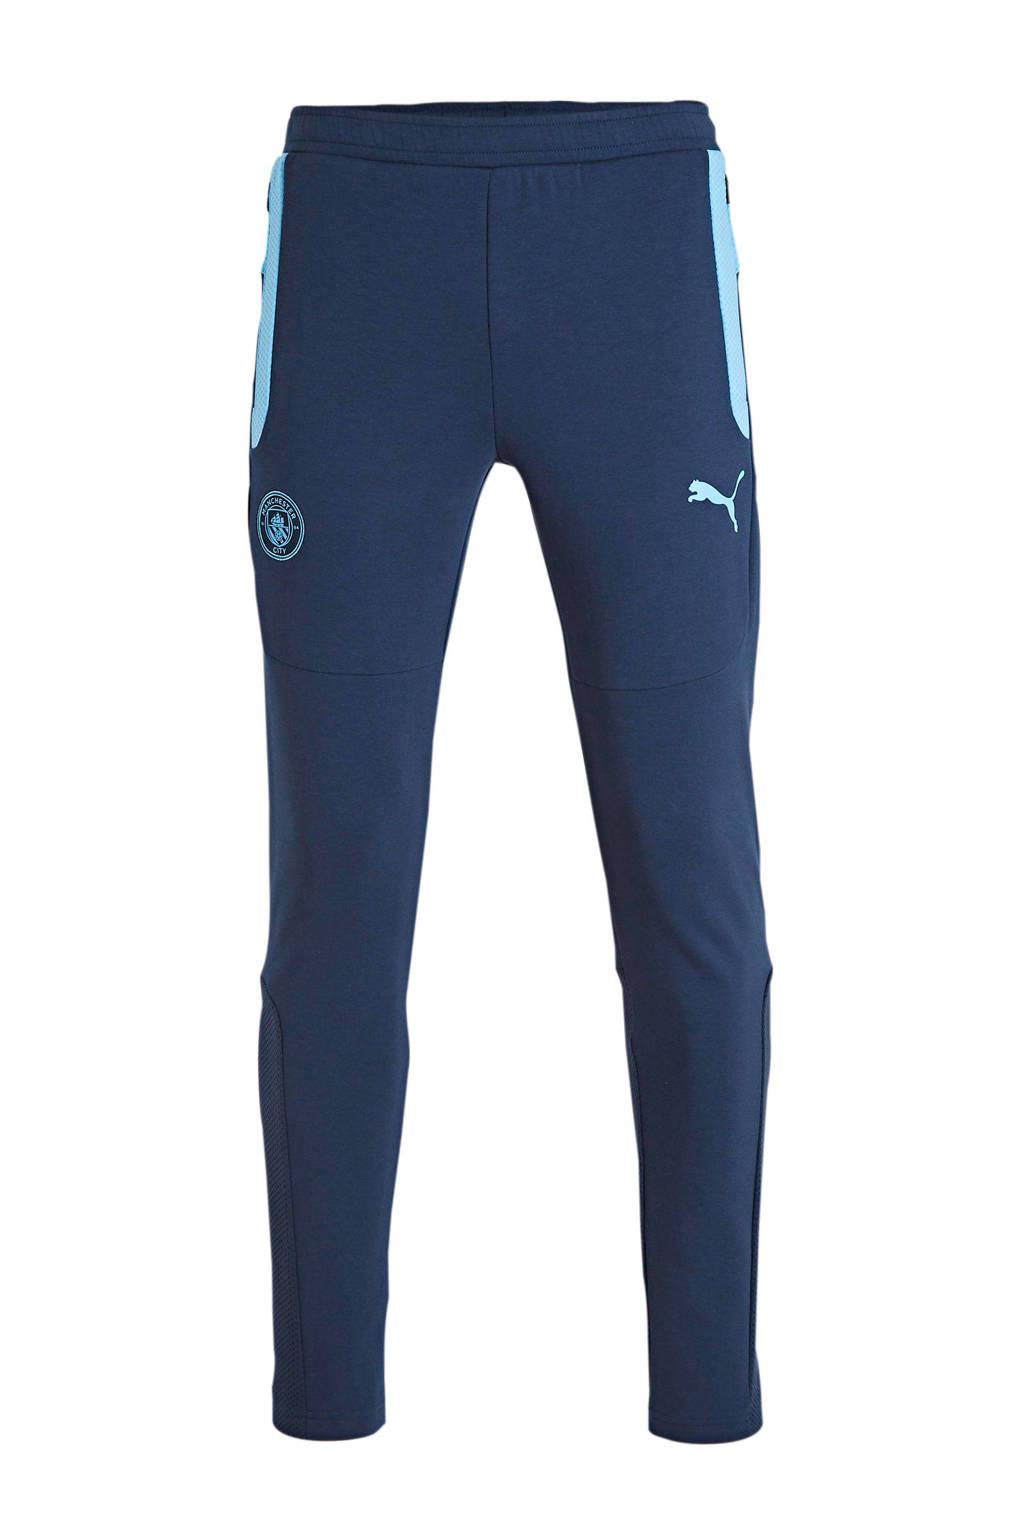 Puma Senior  voetbalbroek donkerblauw/lichtblauw, Donkerblauw/lichtblauw